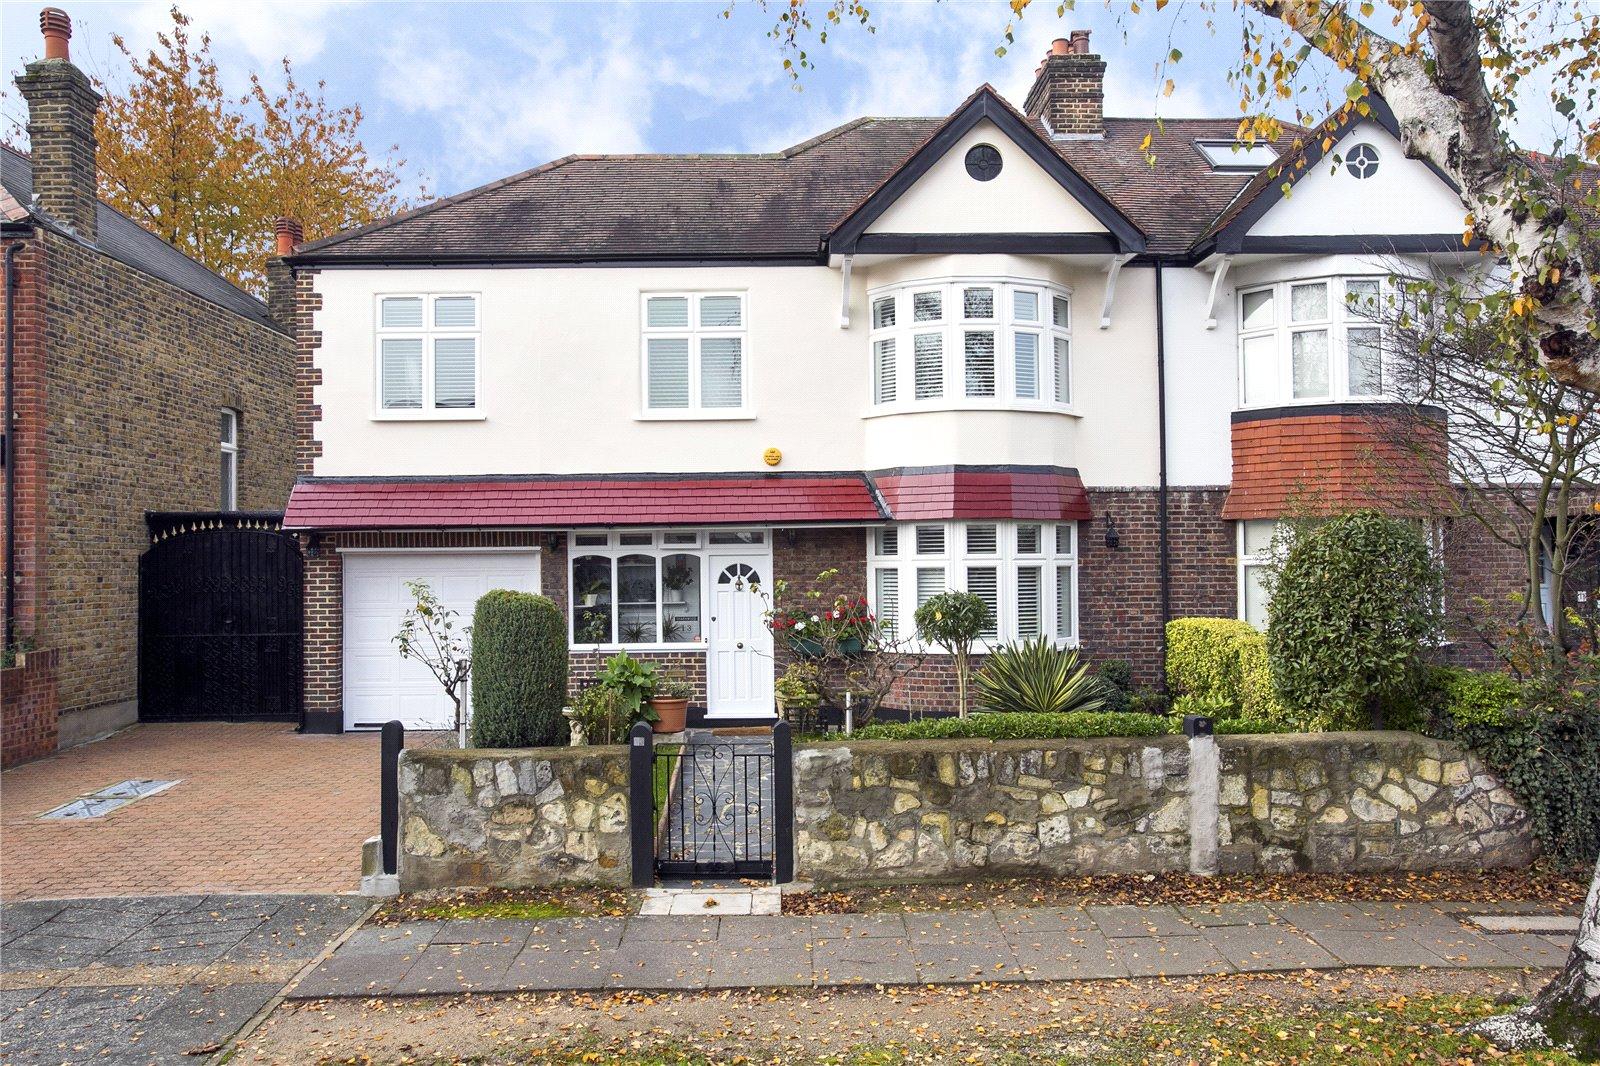 Pensford Avenue, Kew, TW9 4HR - Antony Roberts